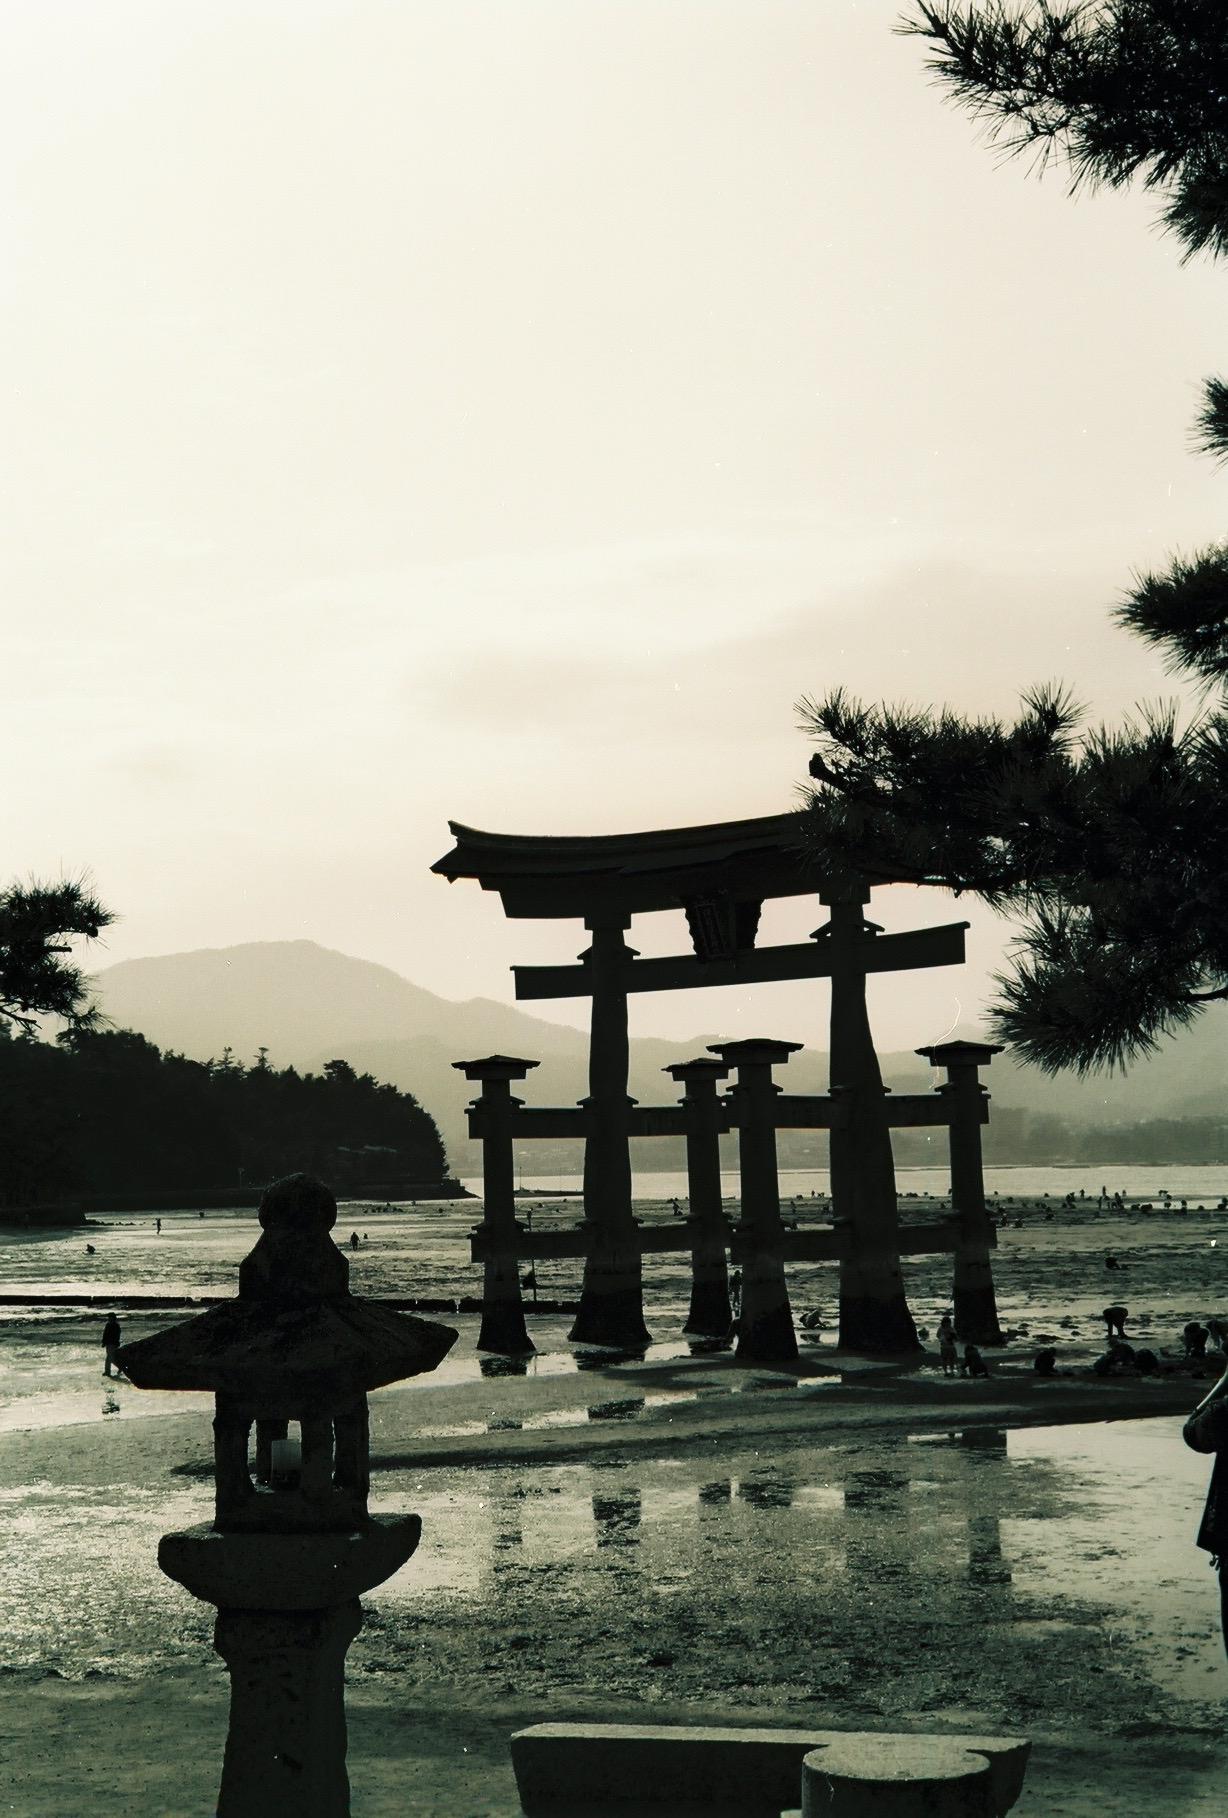 Low tide at Itsukushima Jinja (Miyajima, Japan)